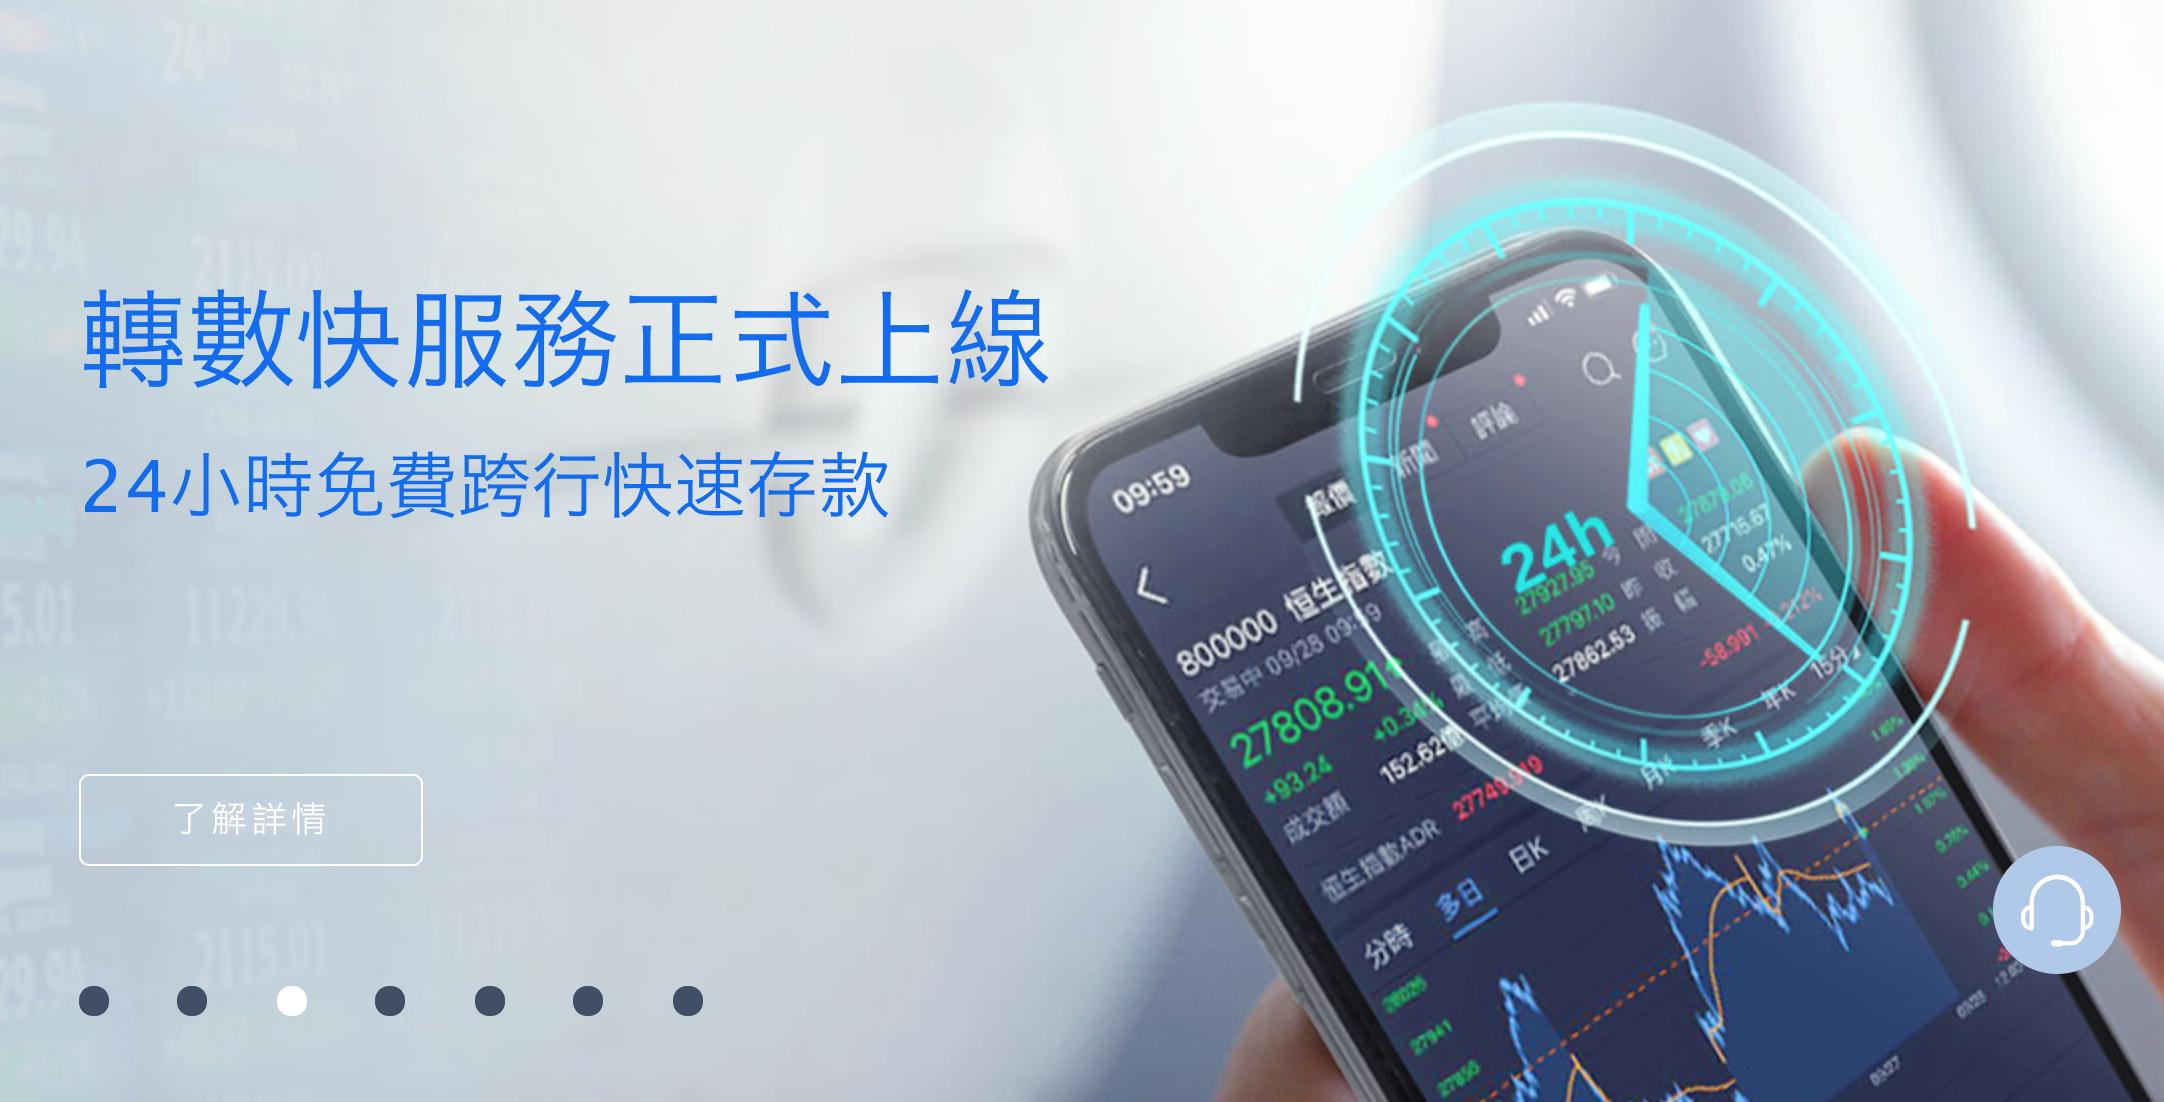 Futu Securities homepage